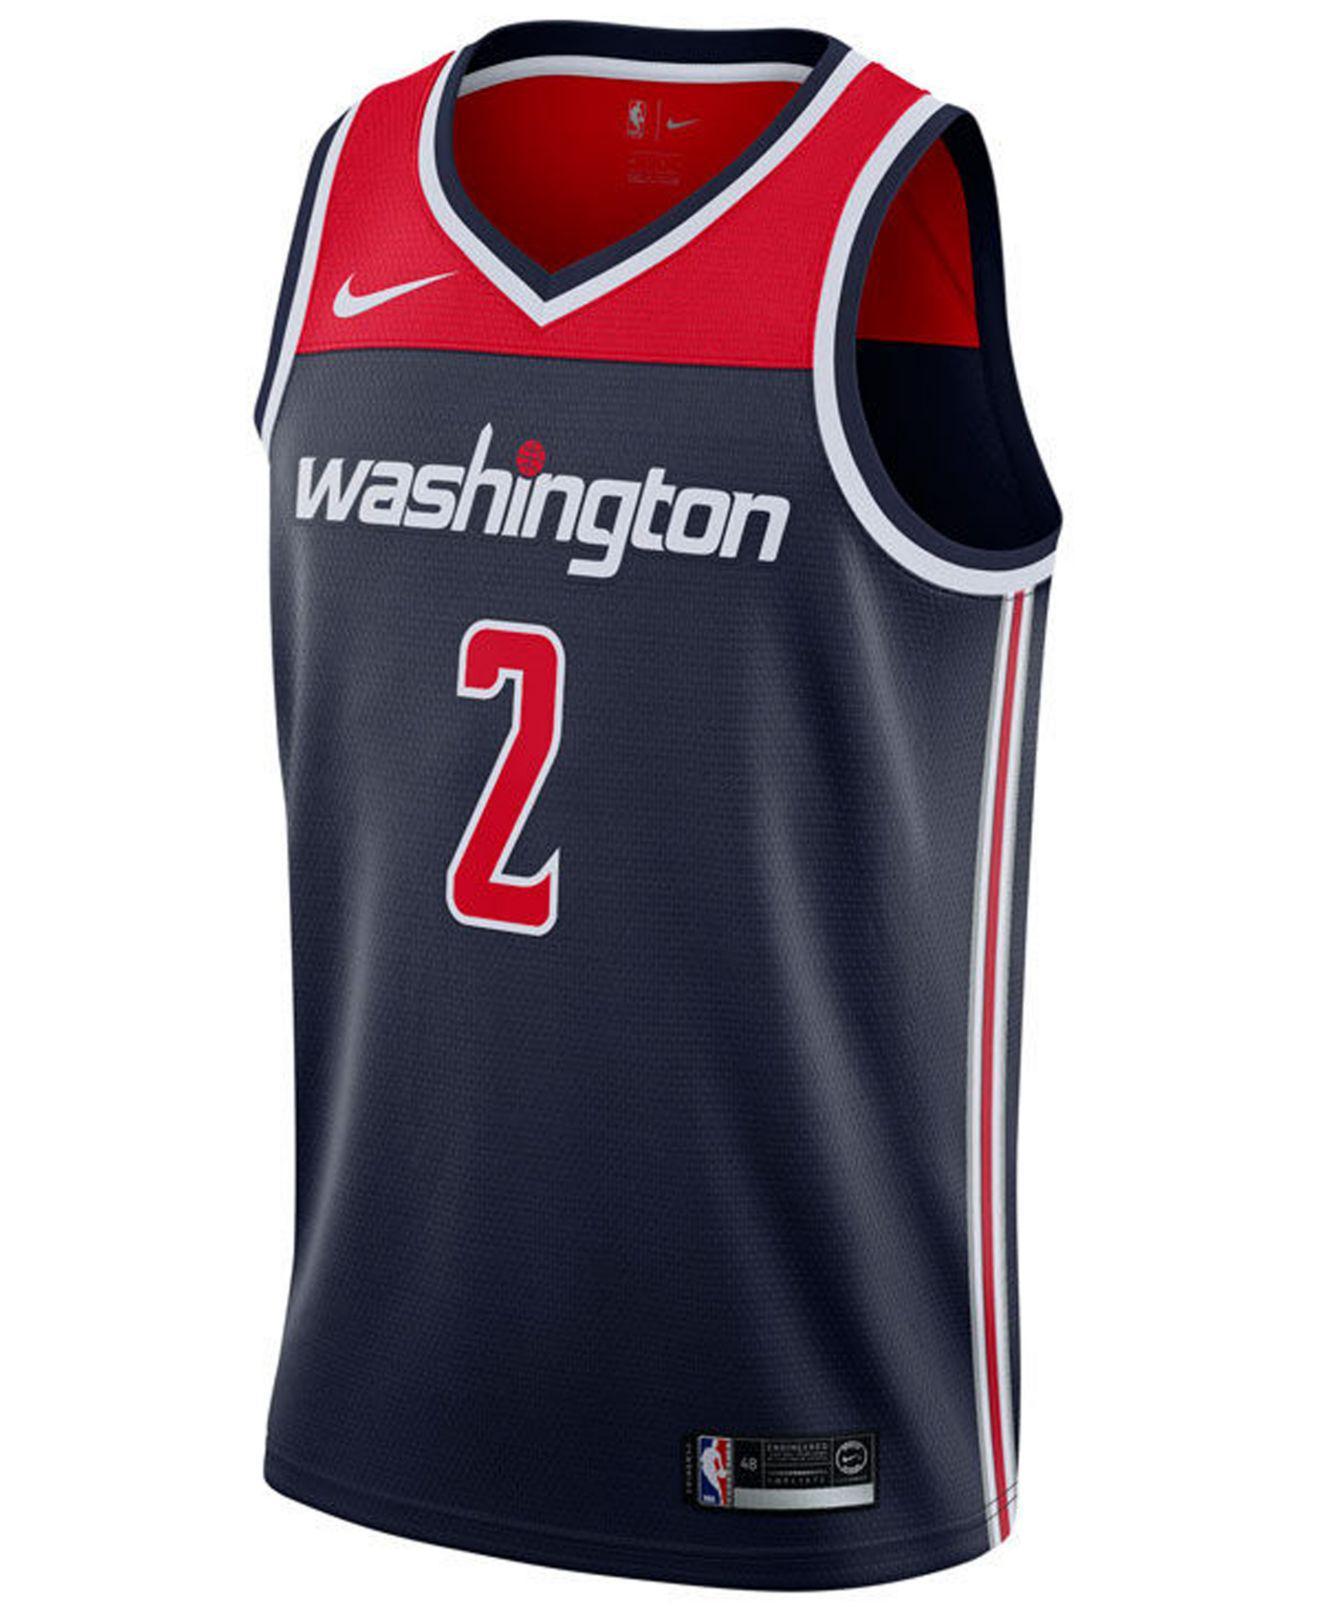 Lyst - Nike John Wall Washington Wizards Statement Swingman Jersey ... 5d9dbc114